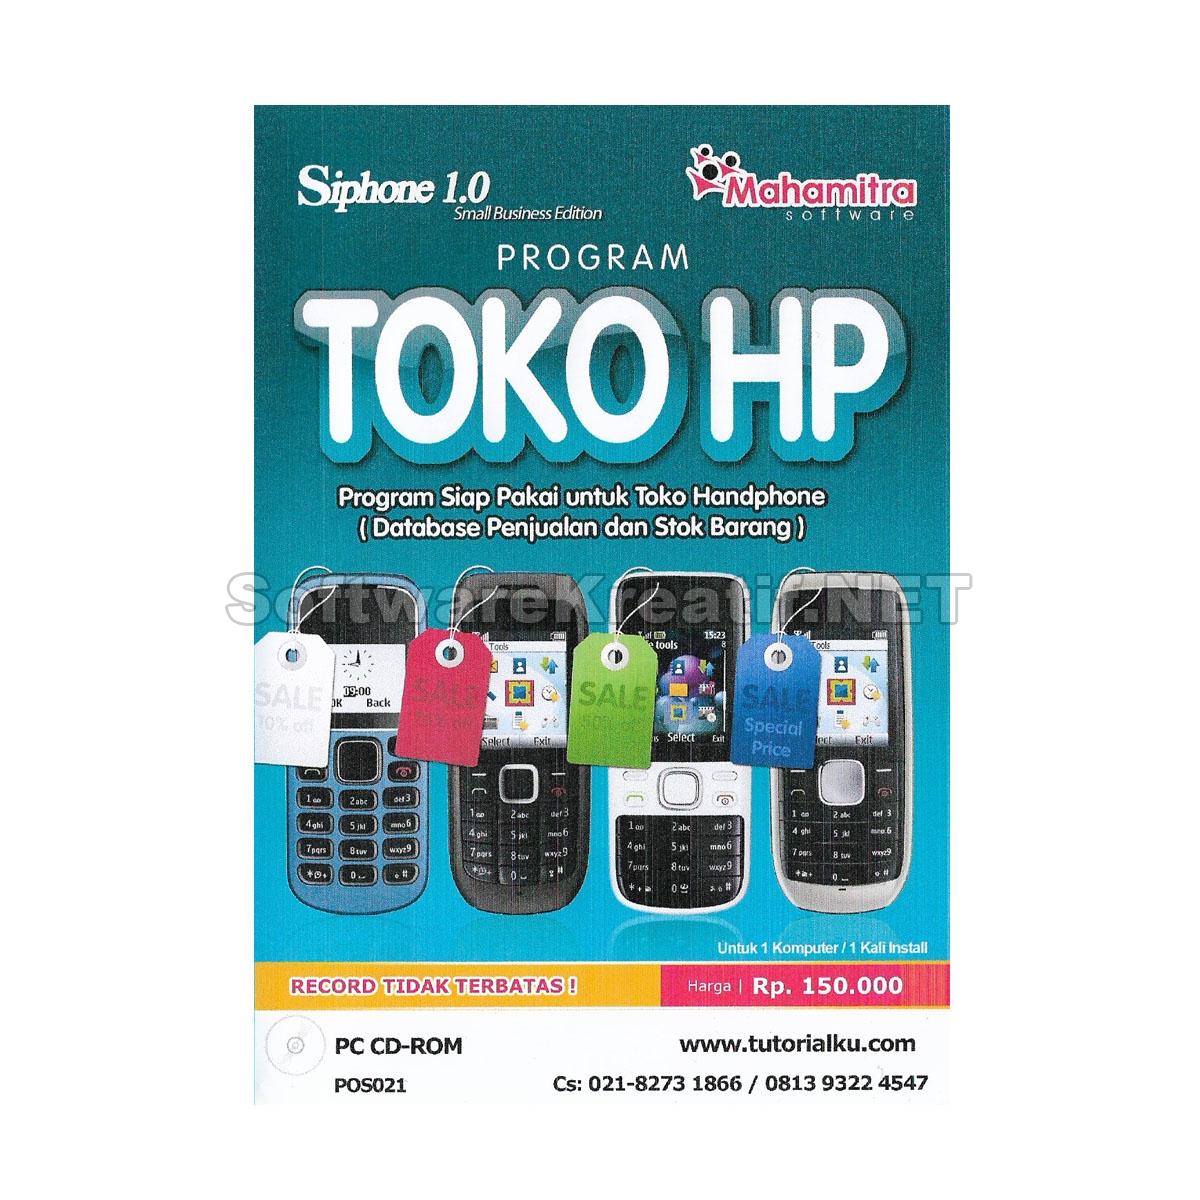 Program Toko HP Siphone 1.0